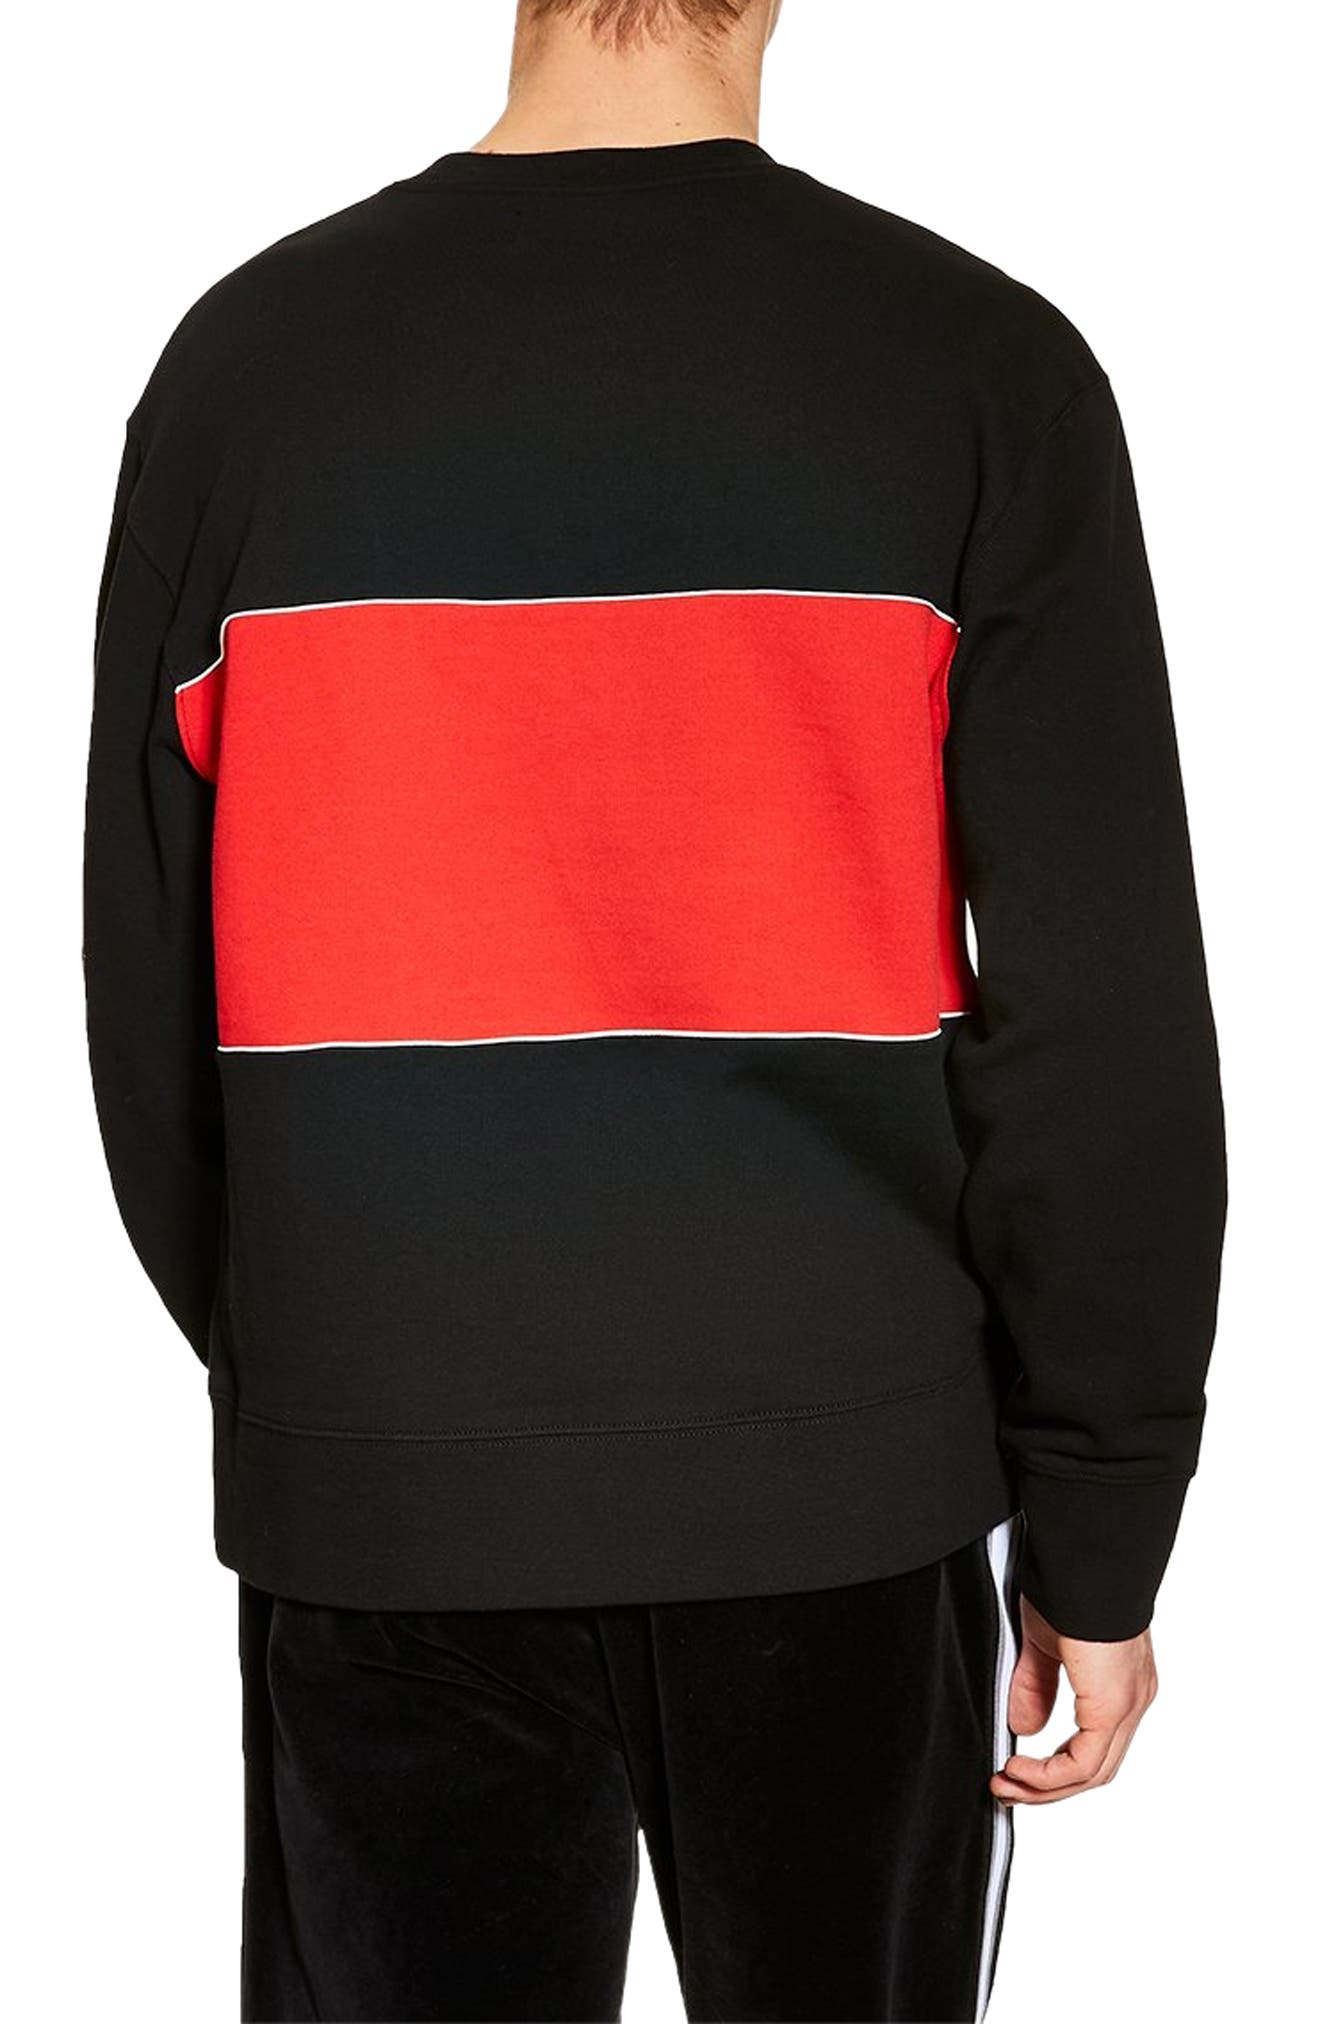 TOPMAN, Colorblock Longline Crewneck Sweatshirt, Alternate thumbnail 2, color, BLACK